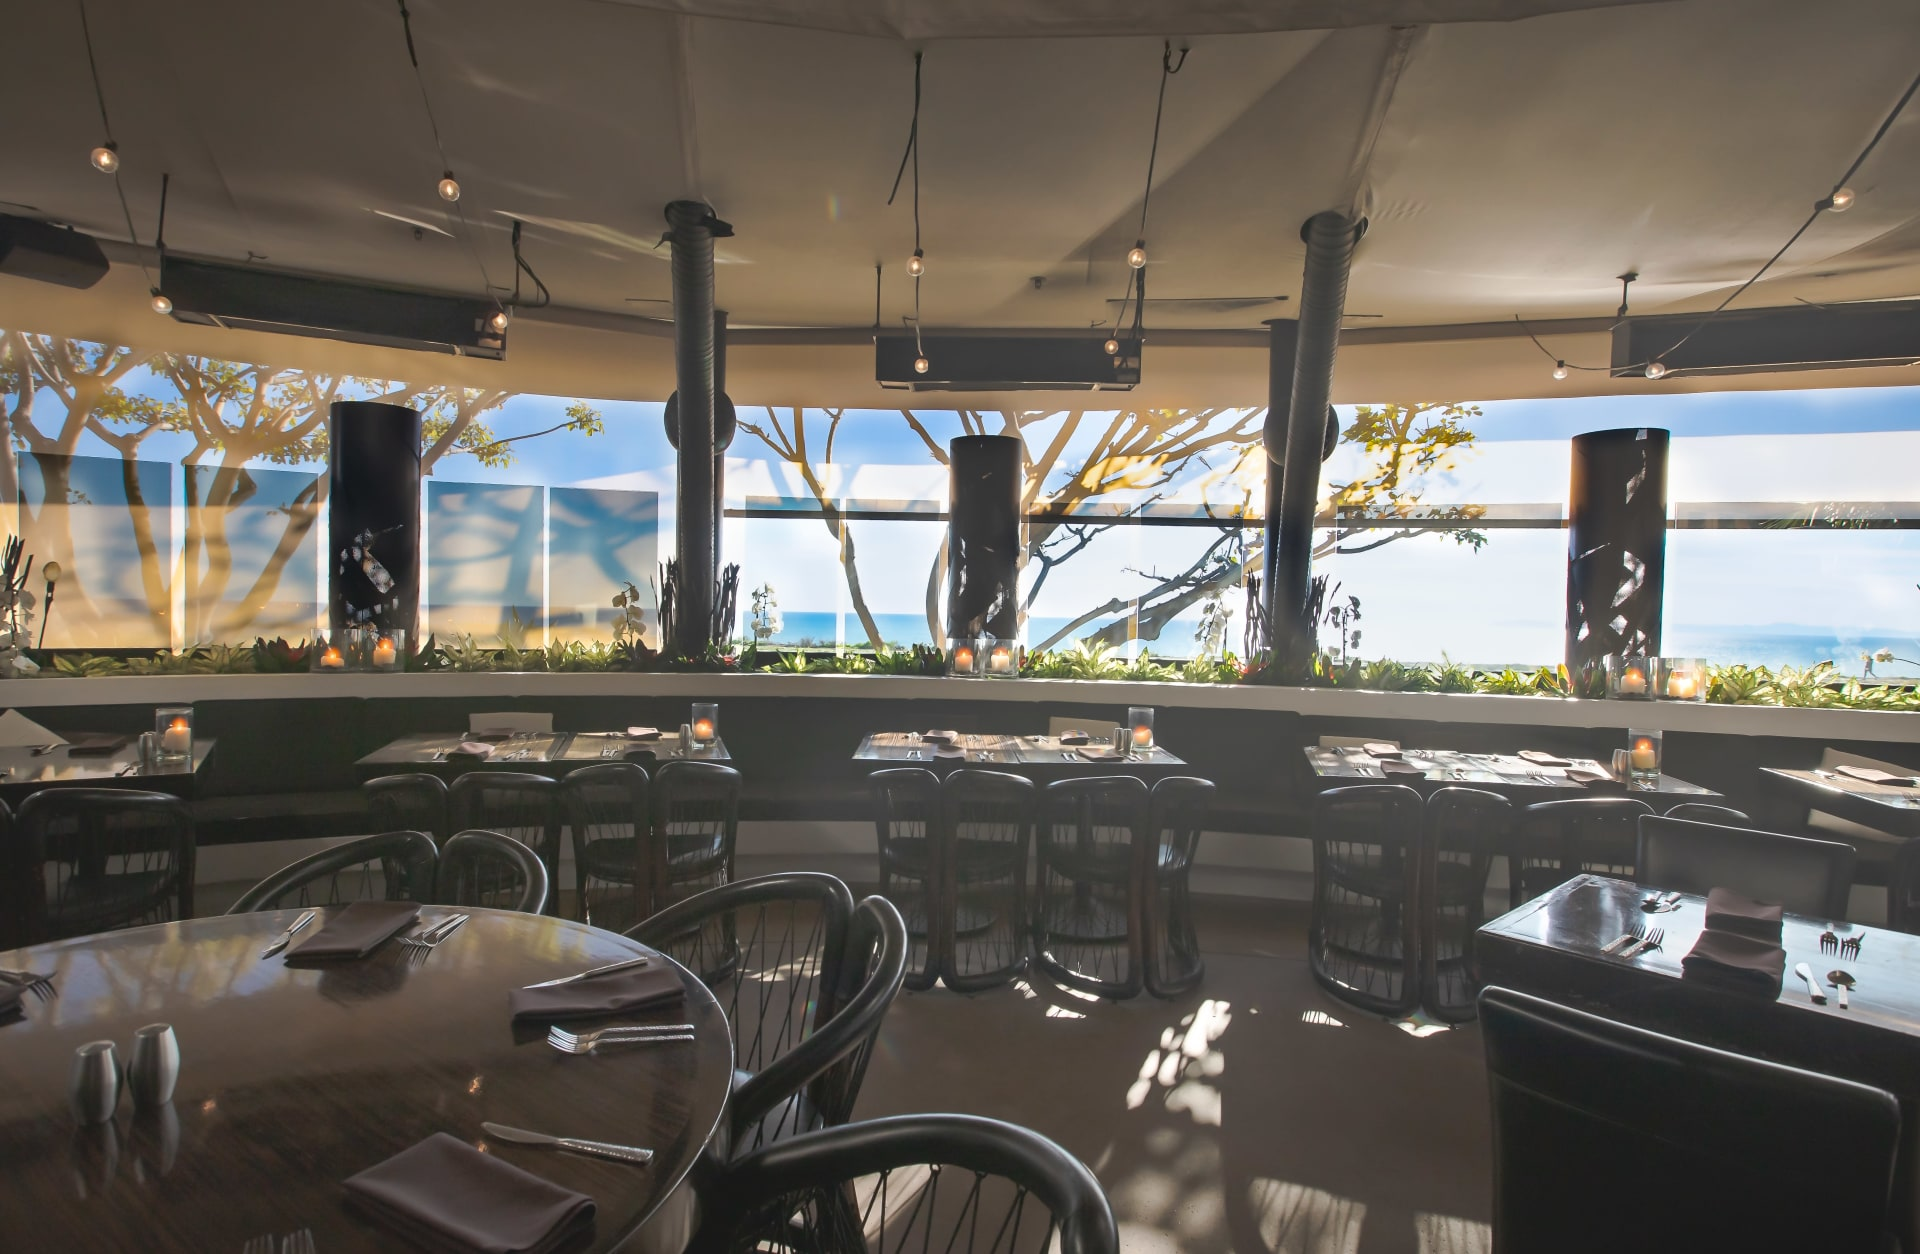 Oceanview Patio Javier's Newport Beach Copyright © 2019 SNAPTASTE® INC.